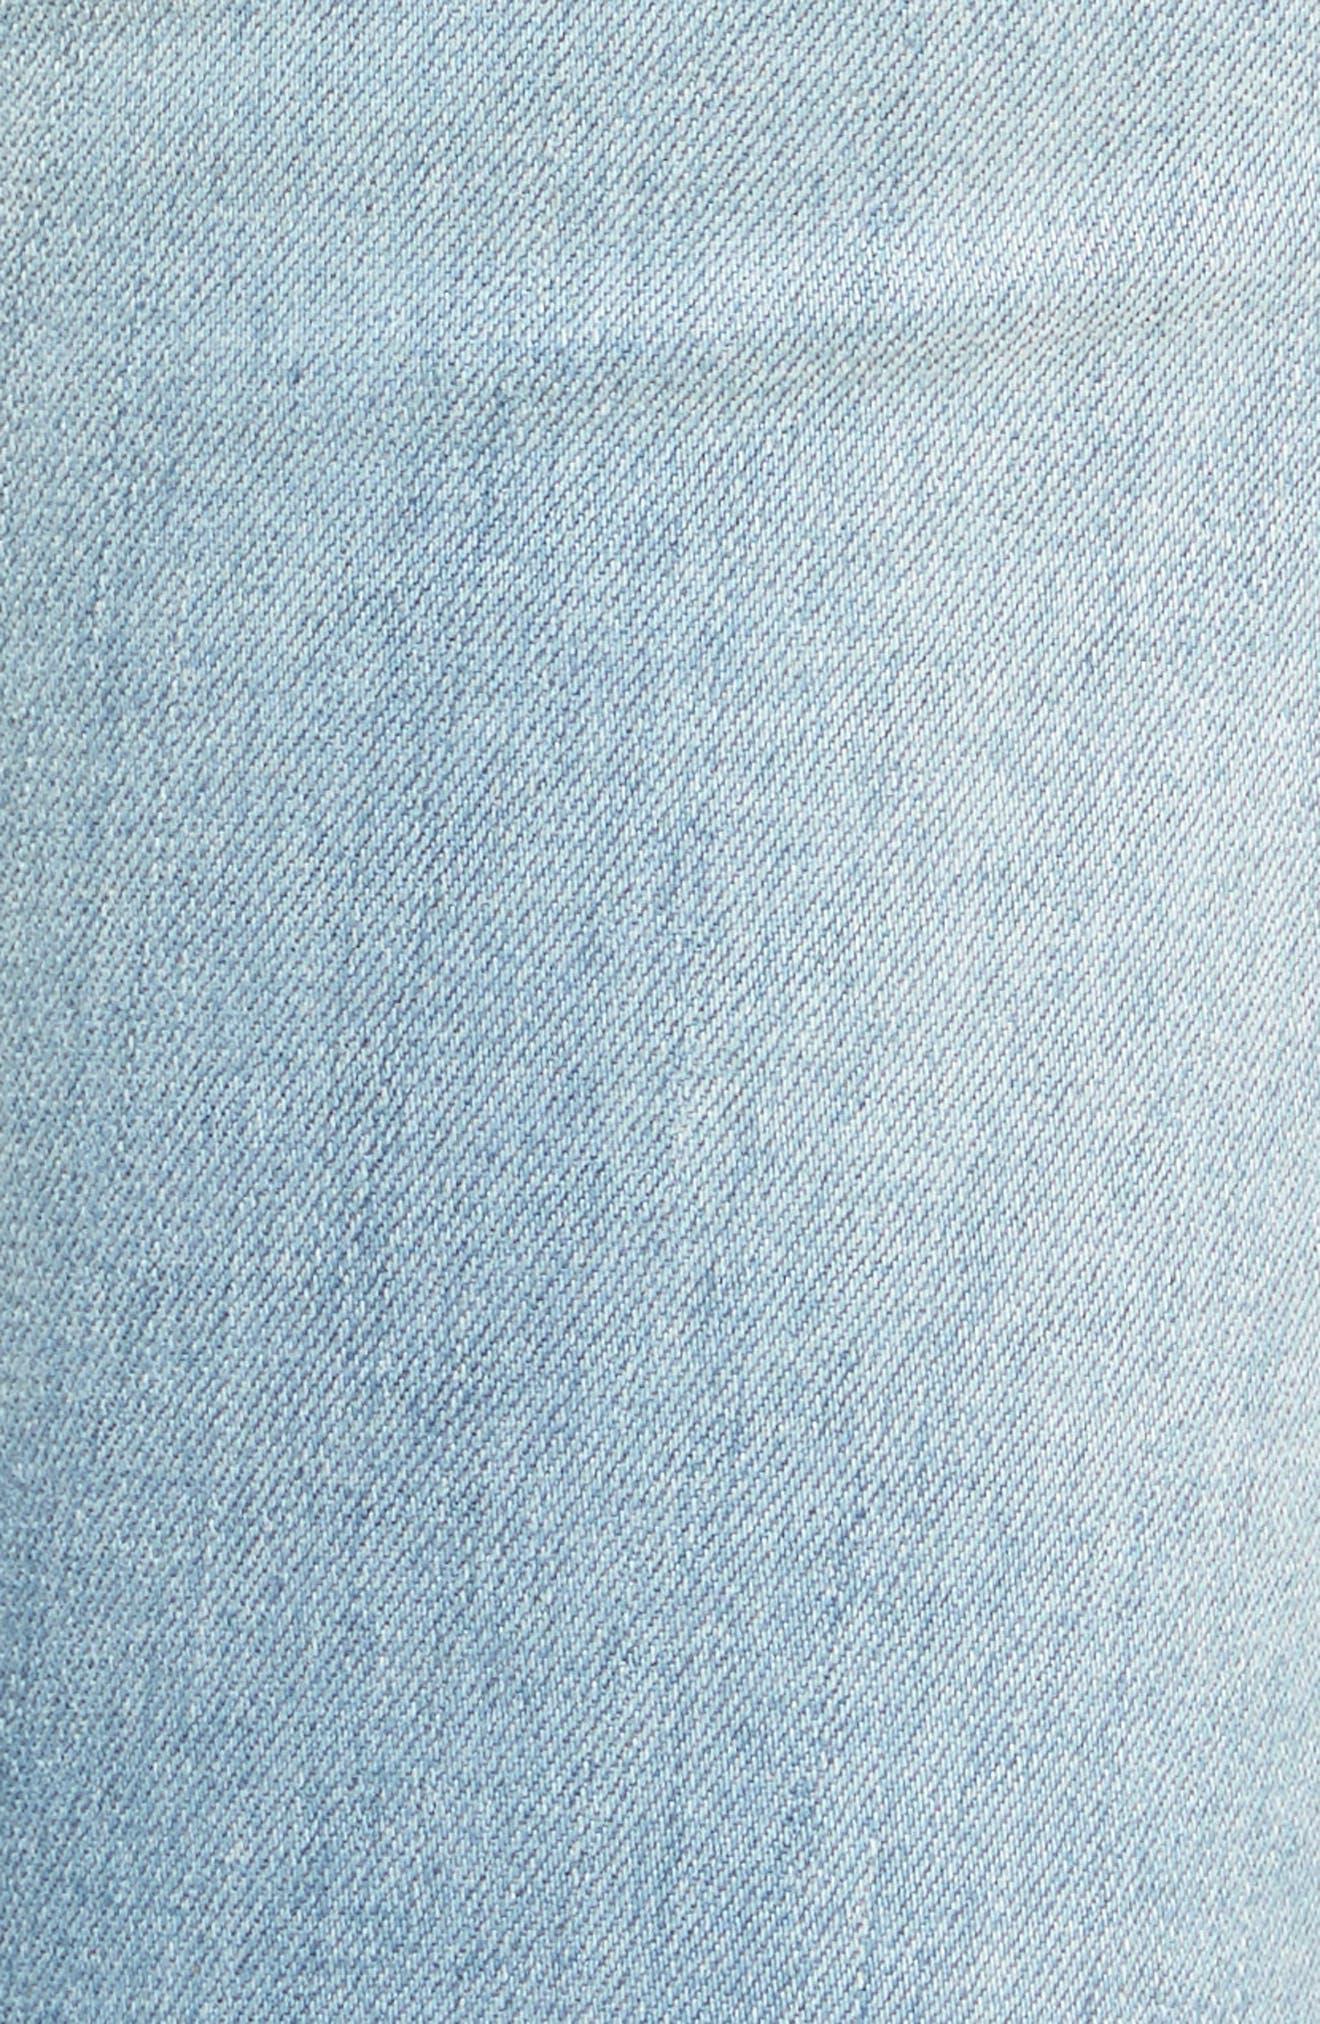 Krista Ankle Super Skinny Jeans,                             Alternate thumbnail 11, color,